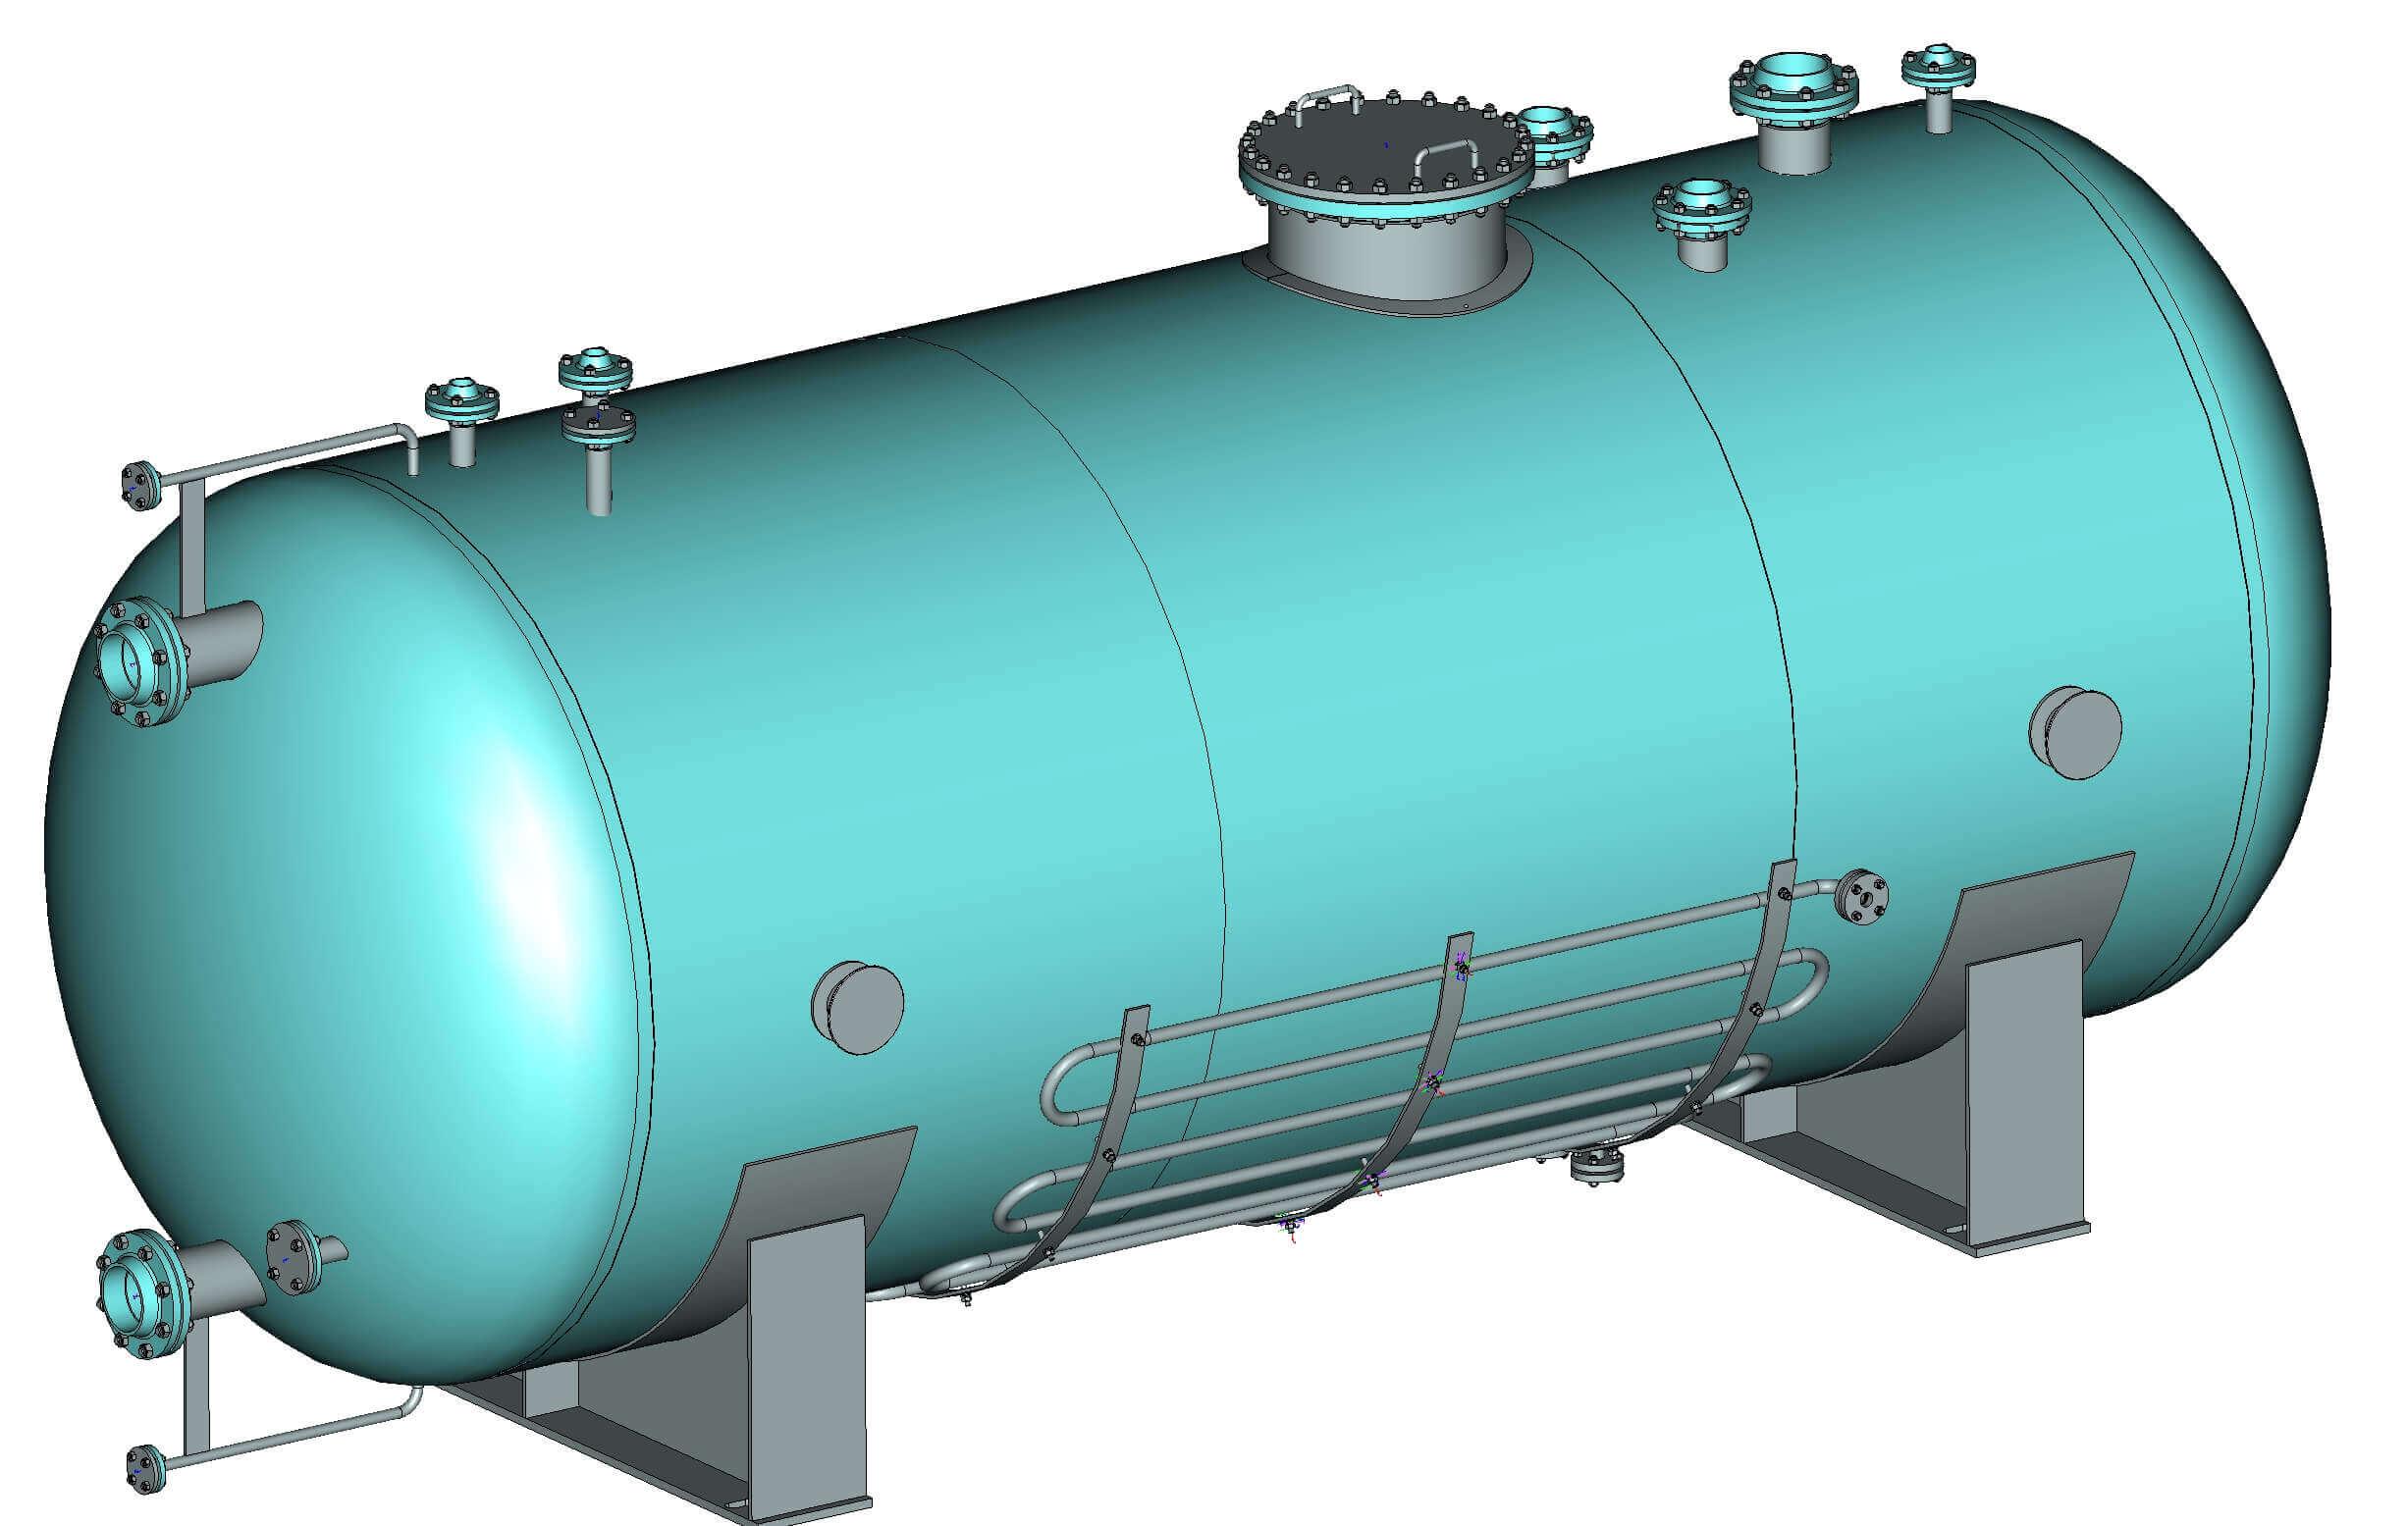 rezervuary i emkosti cilindricheskie rvs rgs 8 Резервуары и емкости цилиндрические (РВС , РГС)